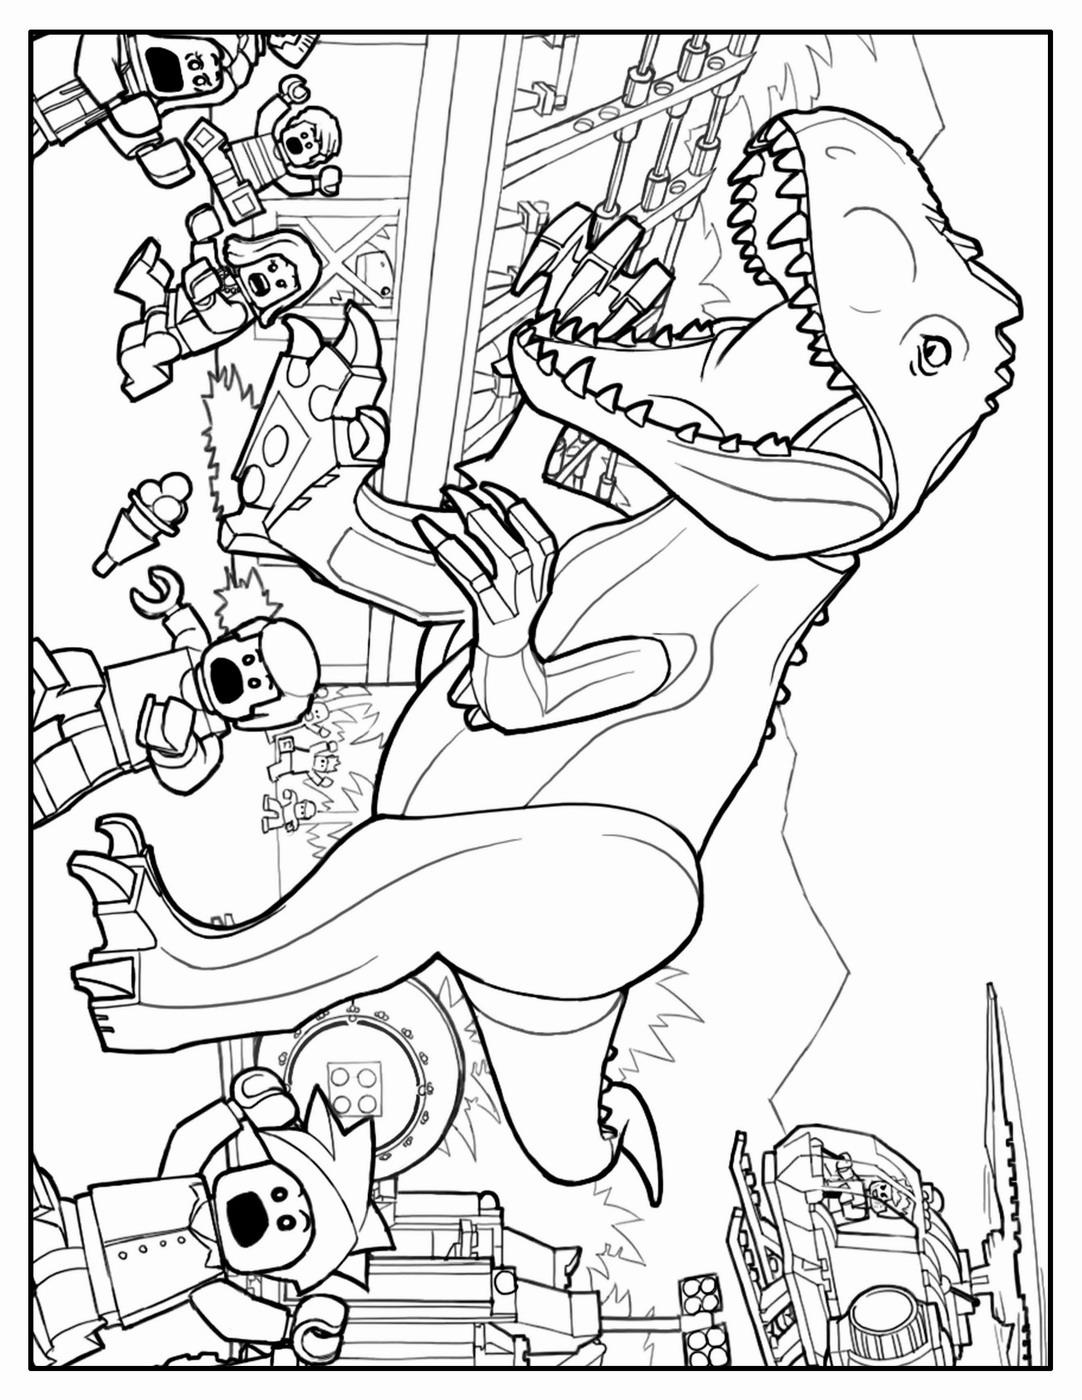 Kleurplaat Jurassic World Dilophosaurus Dilophosaurus ...